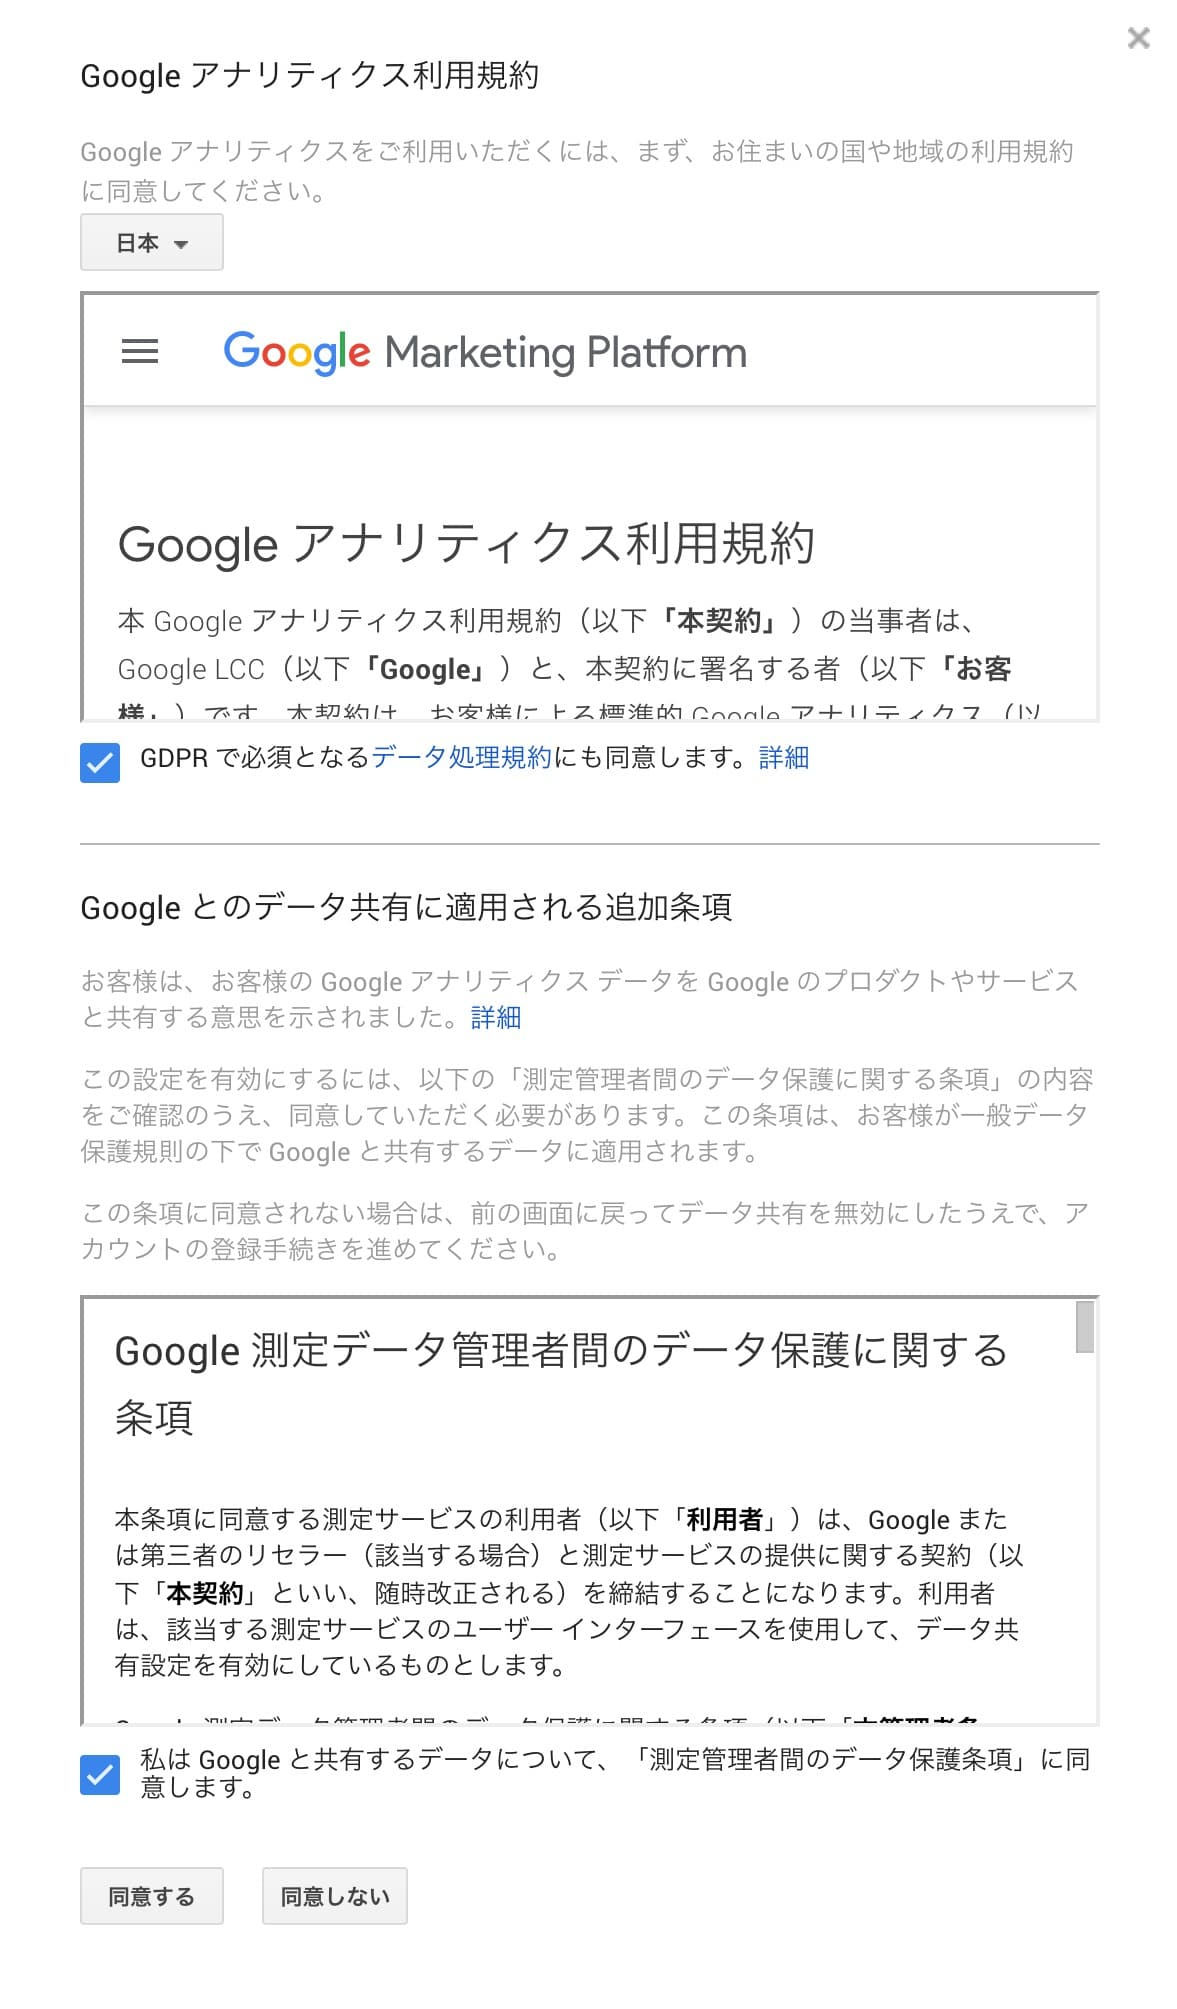 Googleアナリティクスの利用規約・条項に同意する